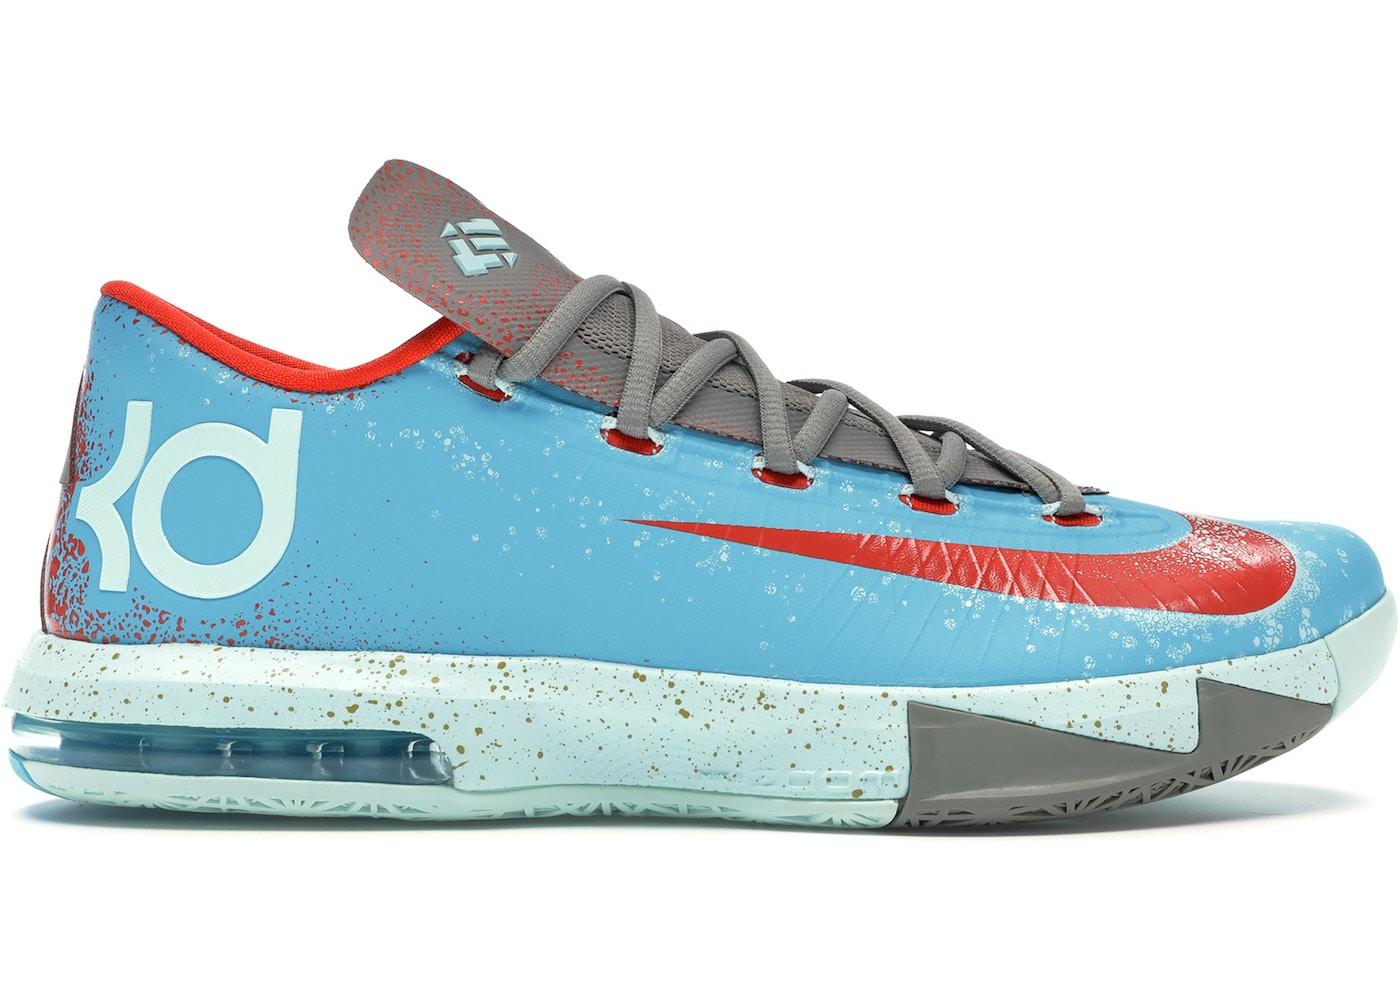 brand new 11b98 8e3fc Buy Nike KD 6 Shoes   Deadstock Sneakers